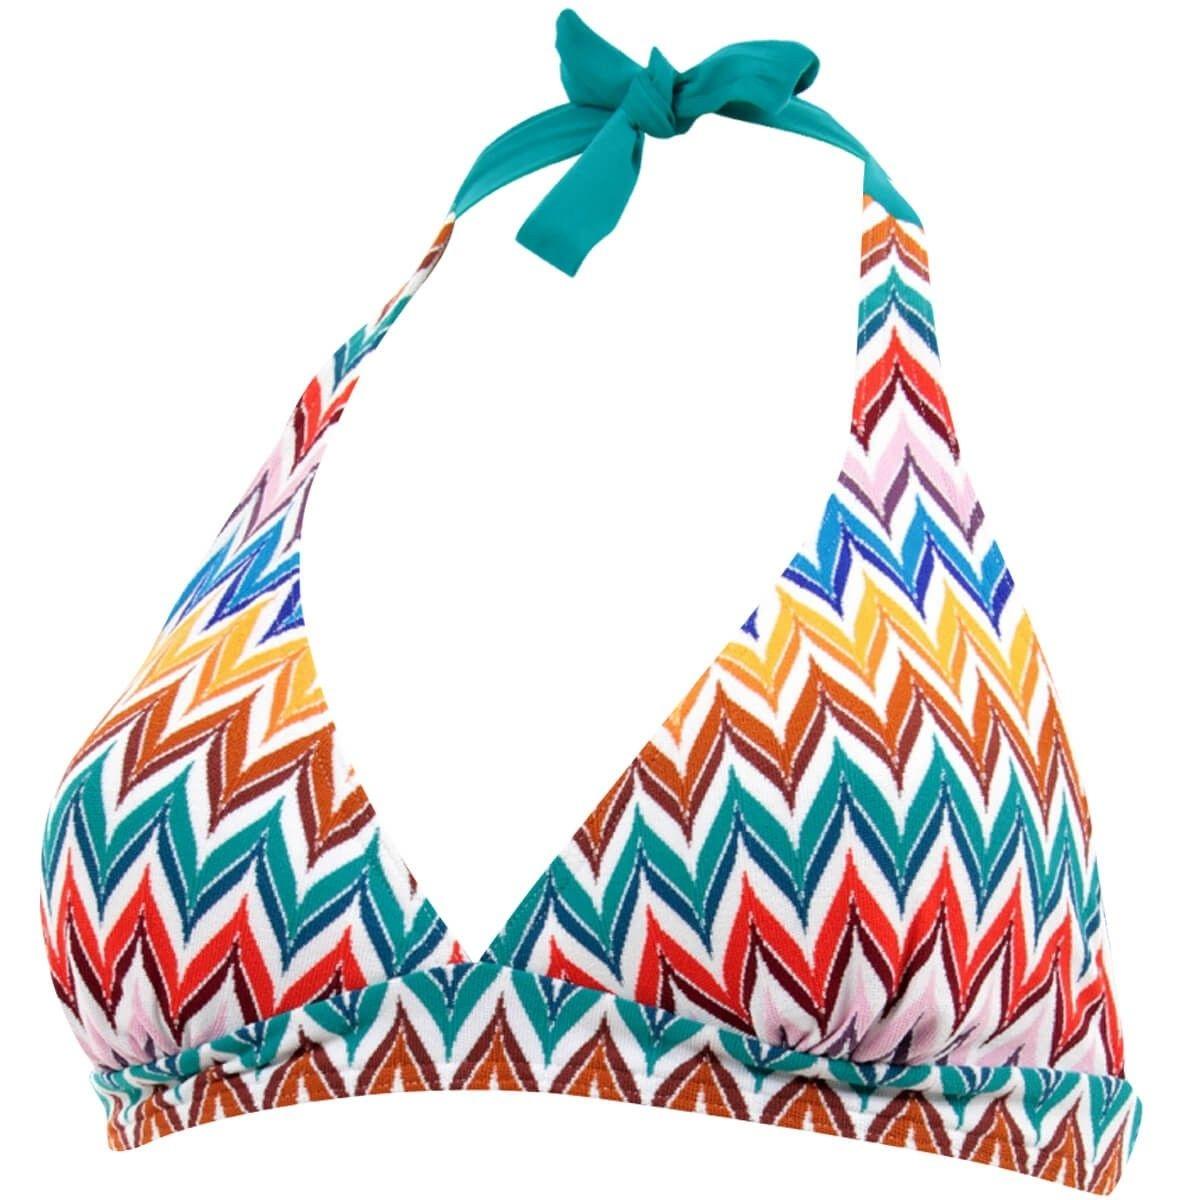 Haut de maillot de bain Triangle foulard mousses amovibles Salvador